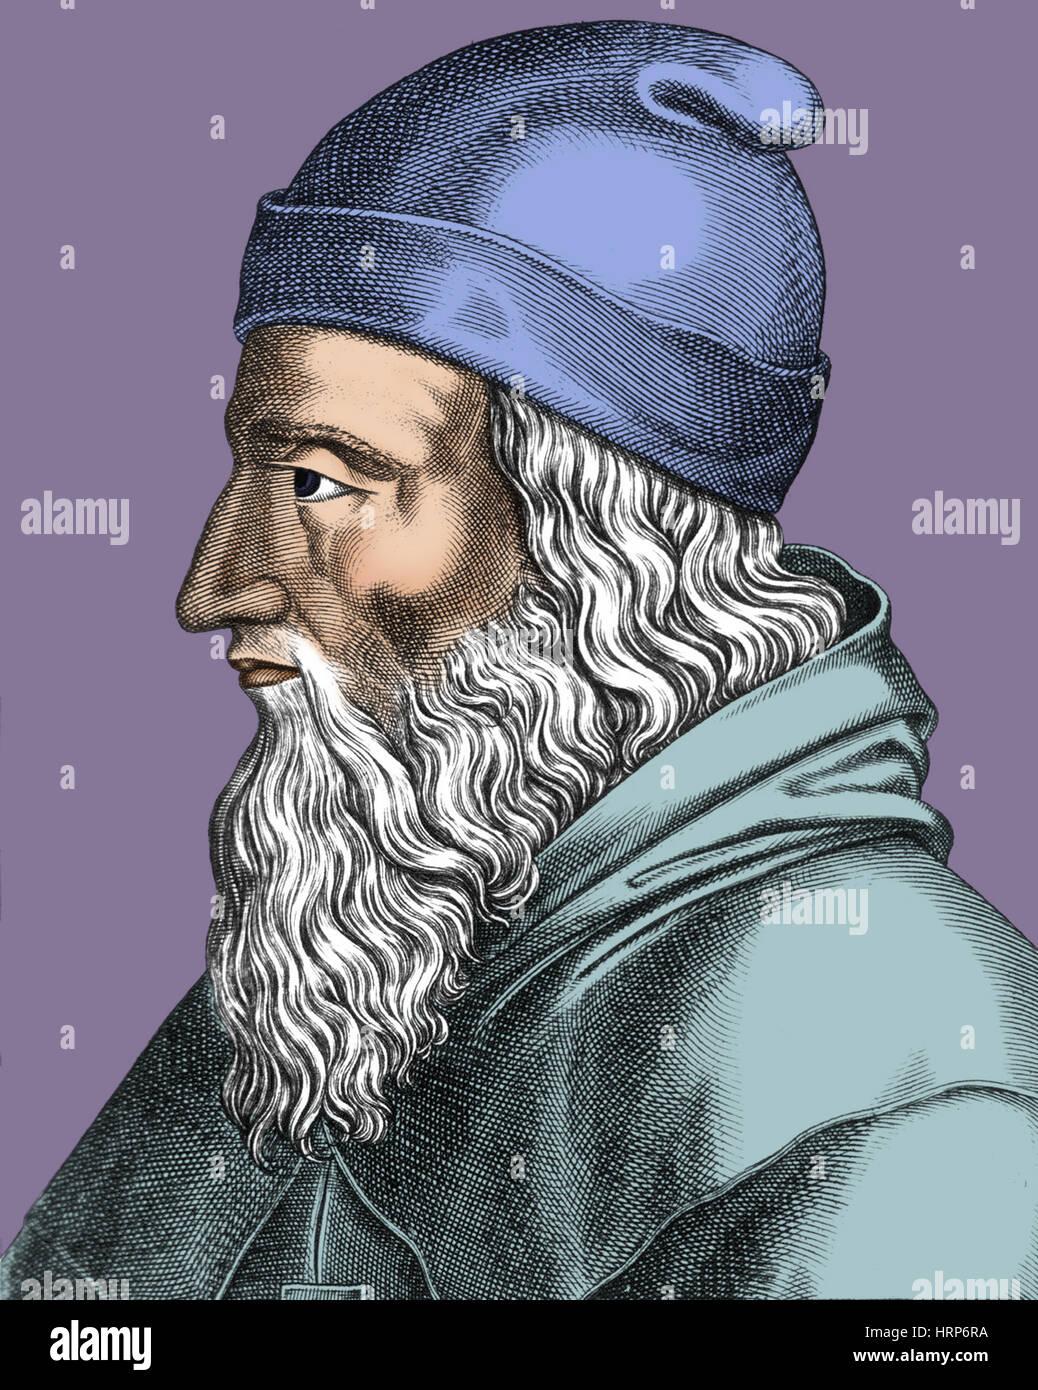 Aristotle, Ancient Greek Philosopher - Stock Image